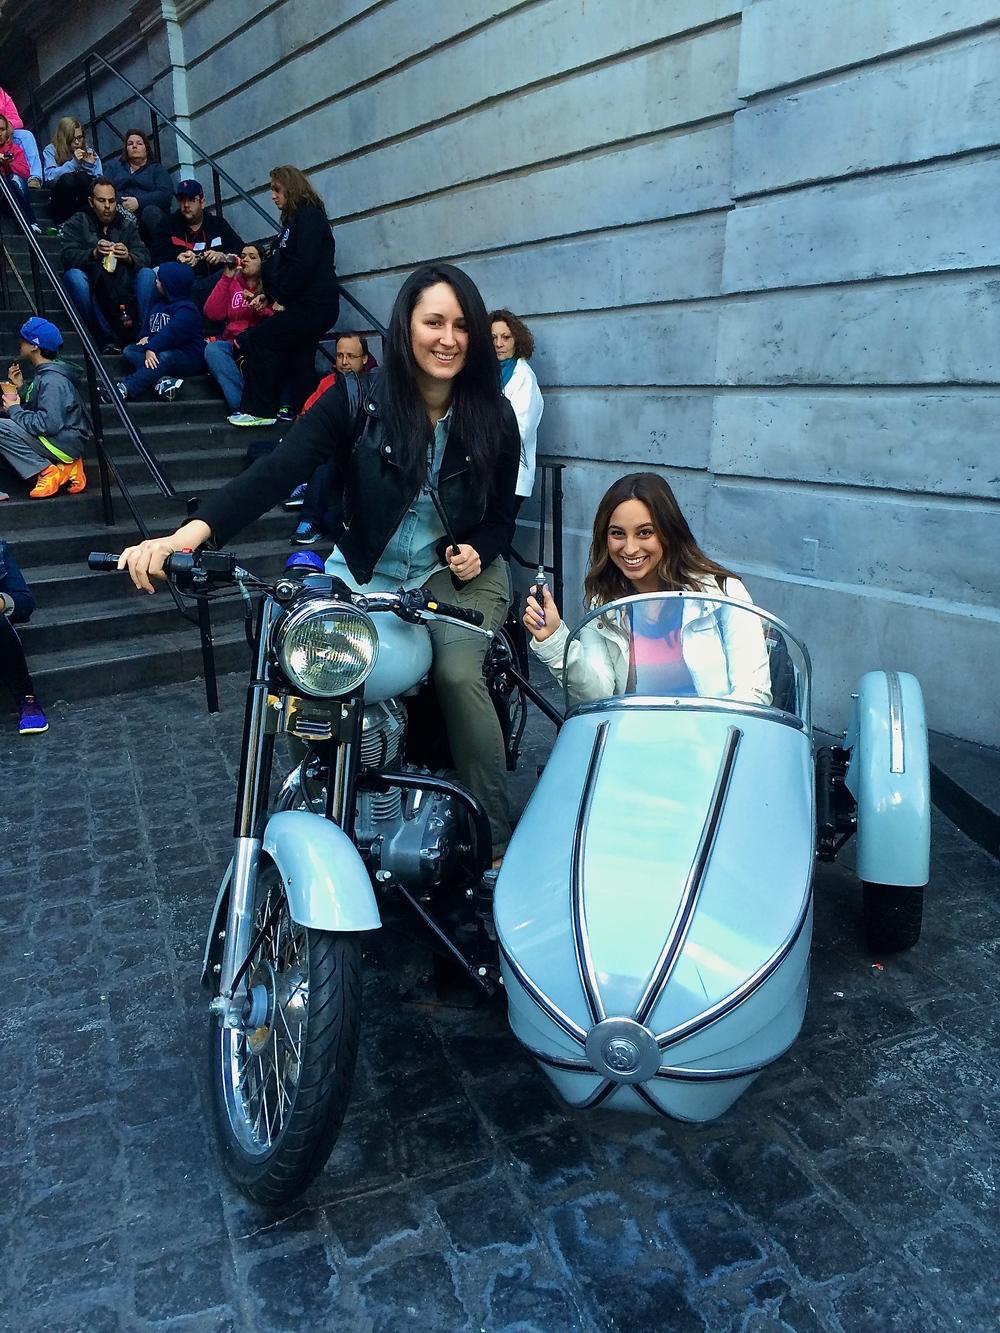 Hagrid's Motorcycle